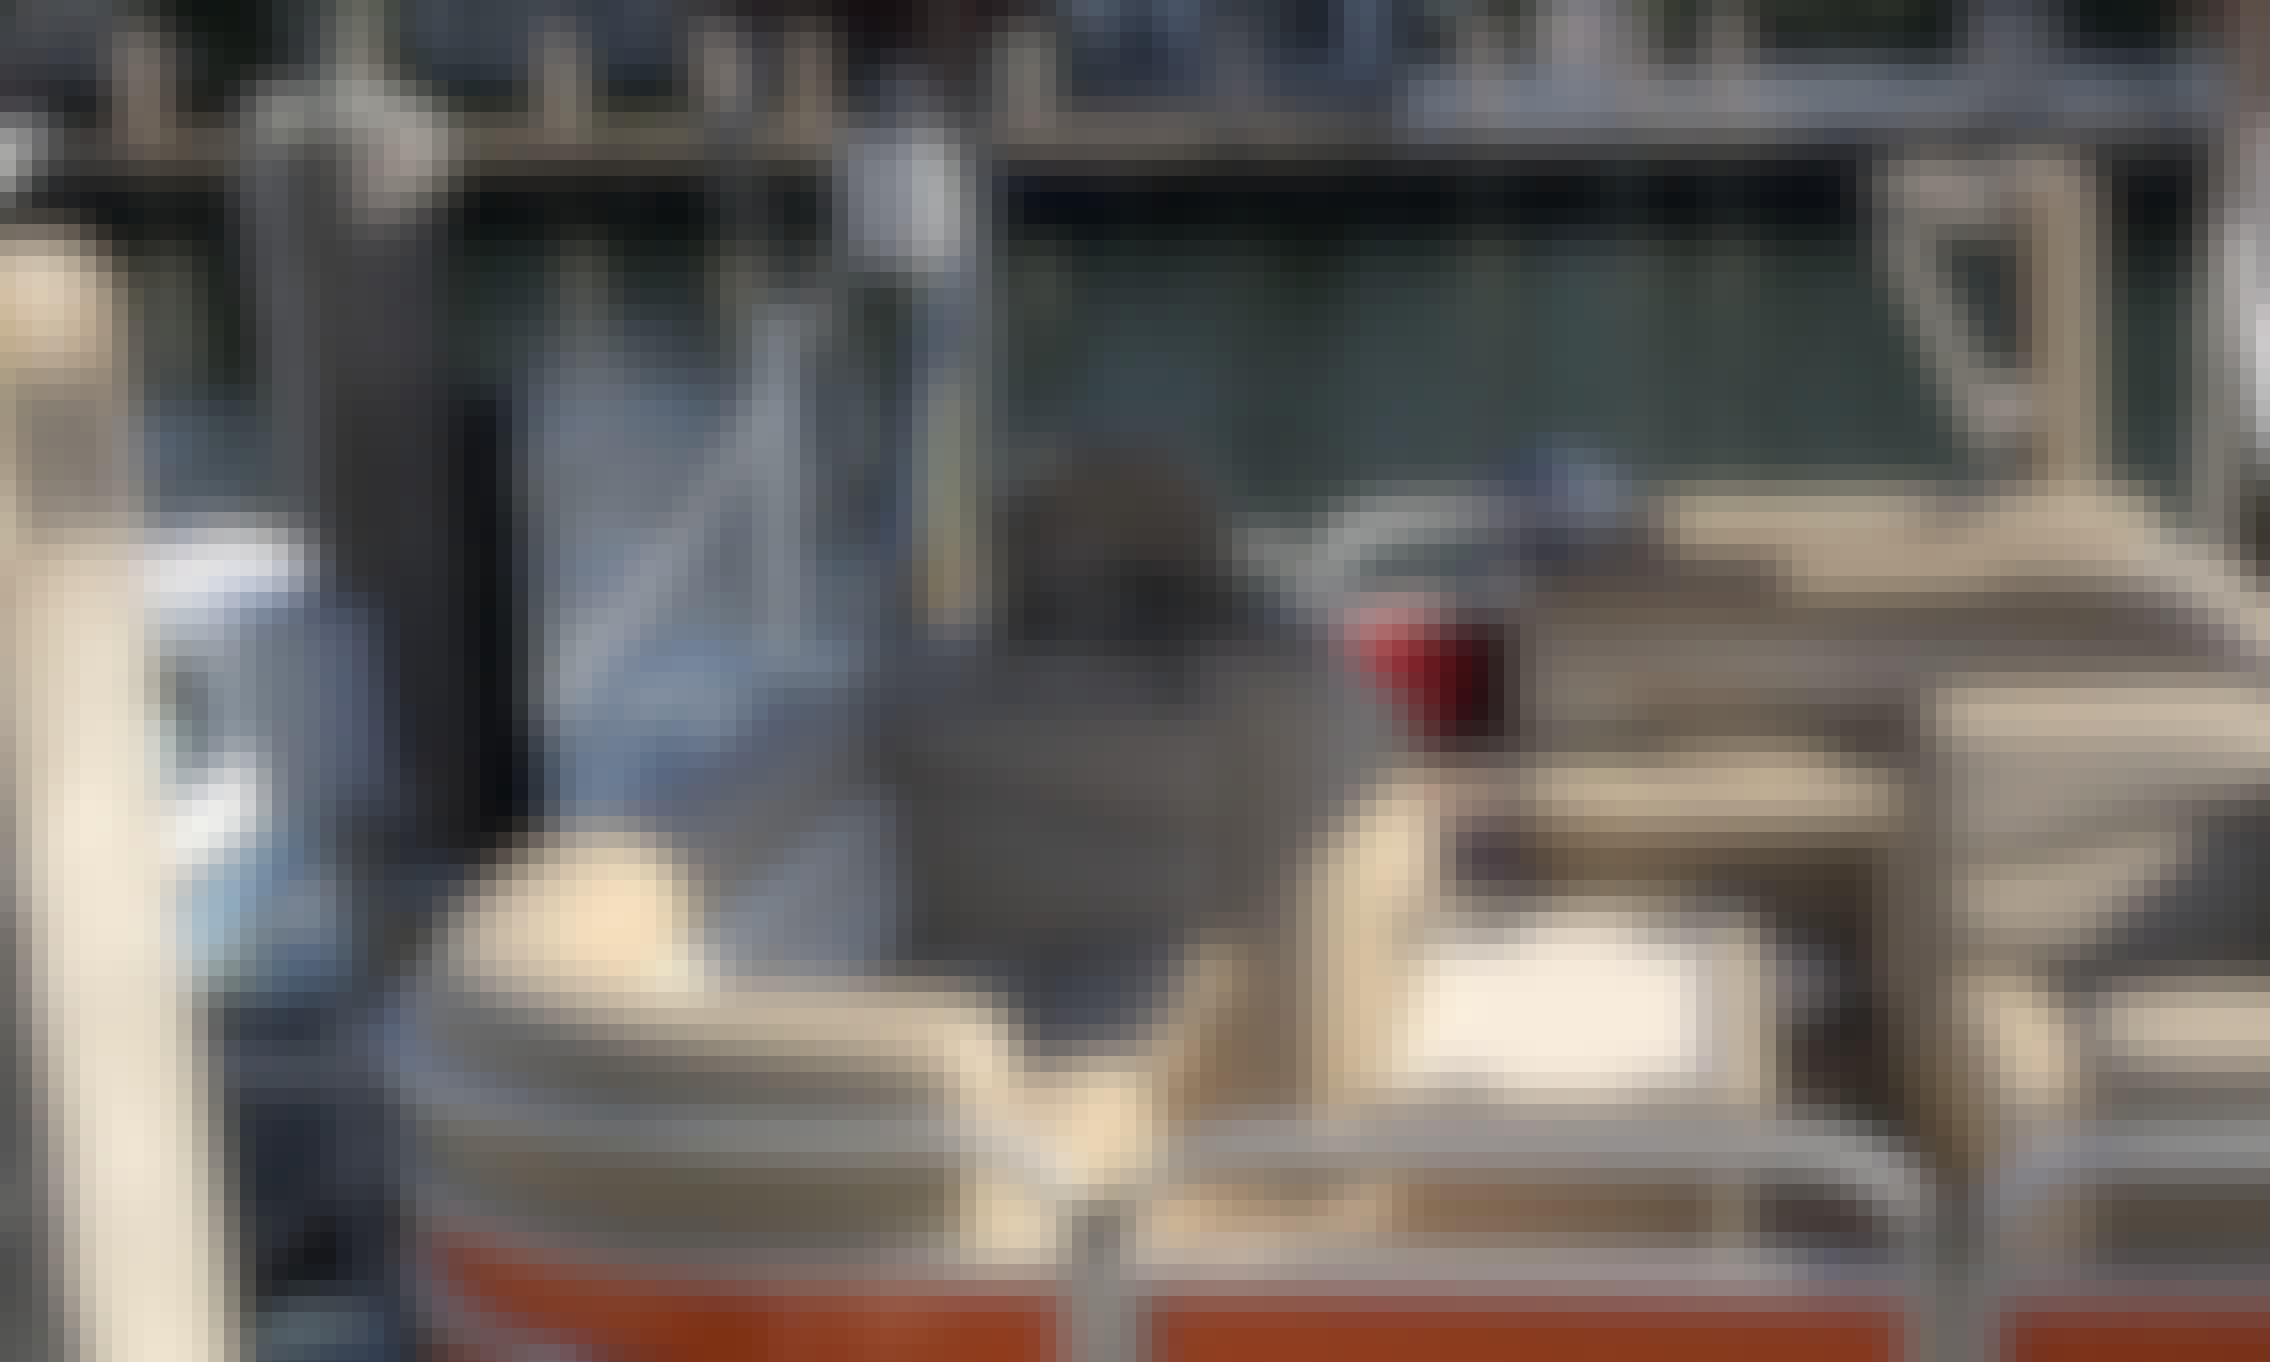 Epic Party Boat for 12 People - Bennington 22 SSL Pontoon In Fort Lauderdale, Florida!